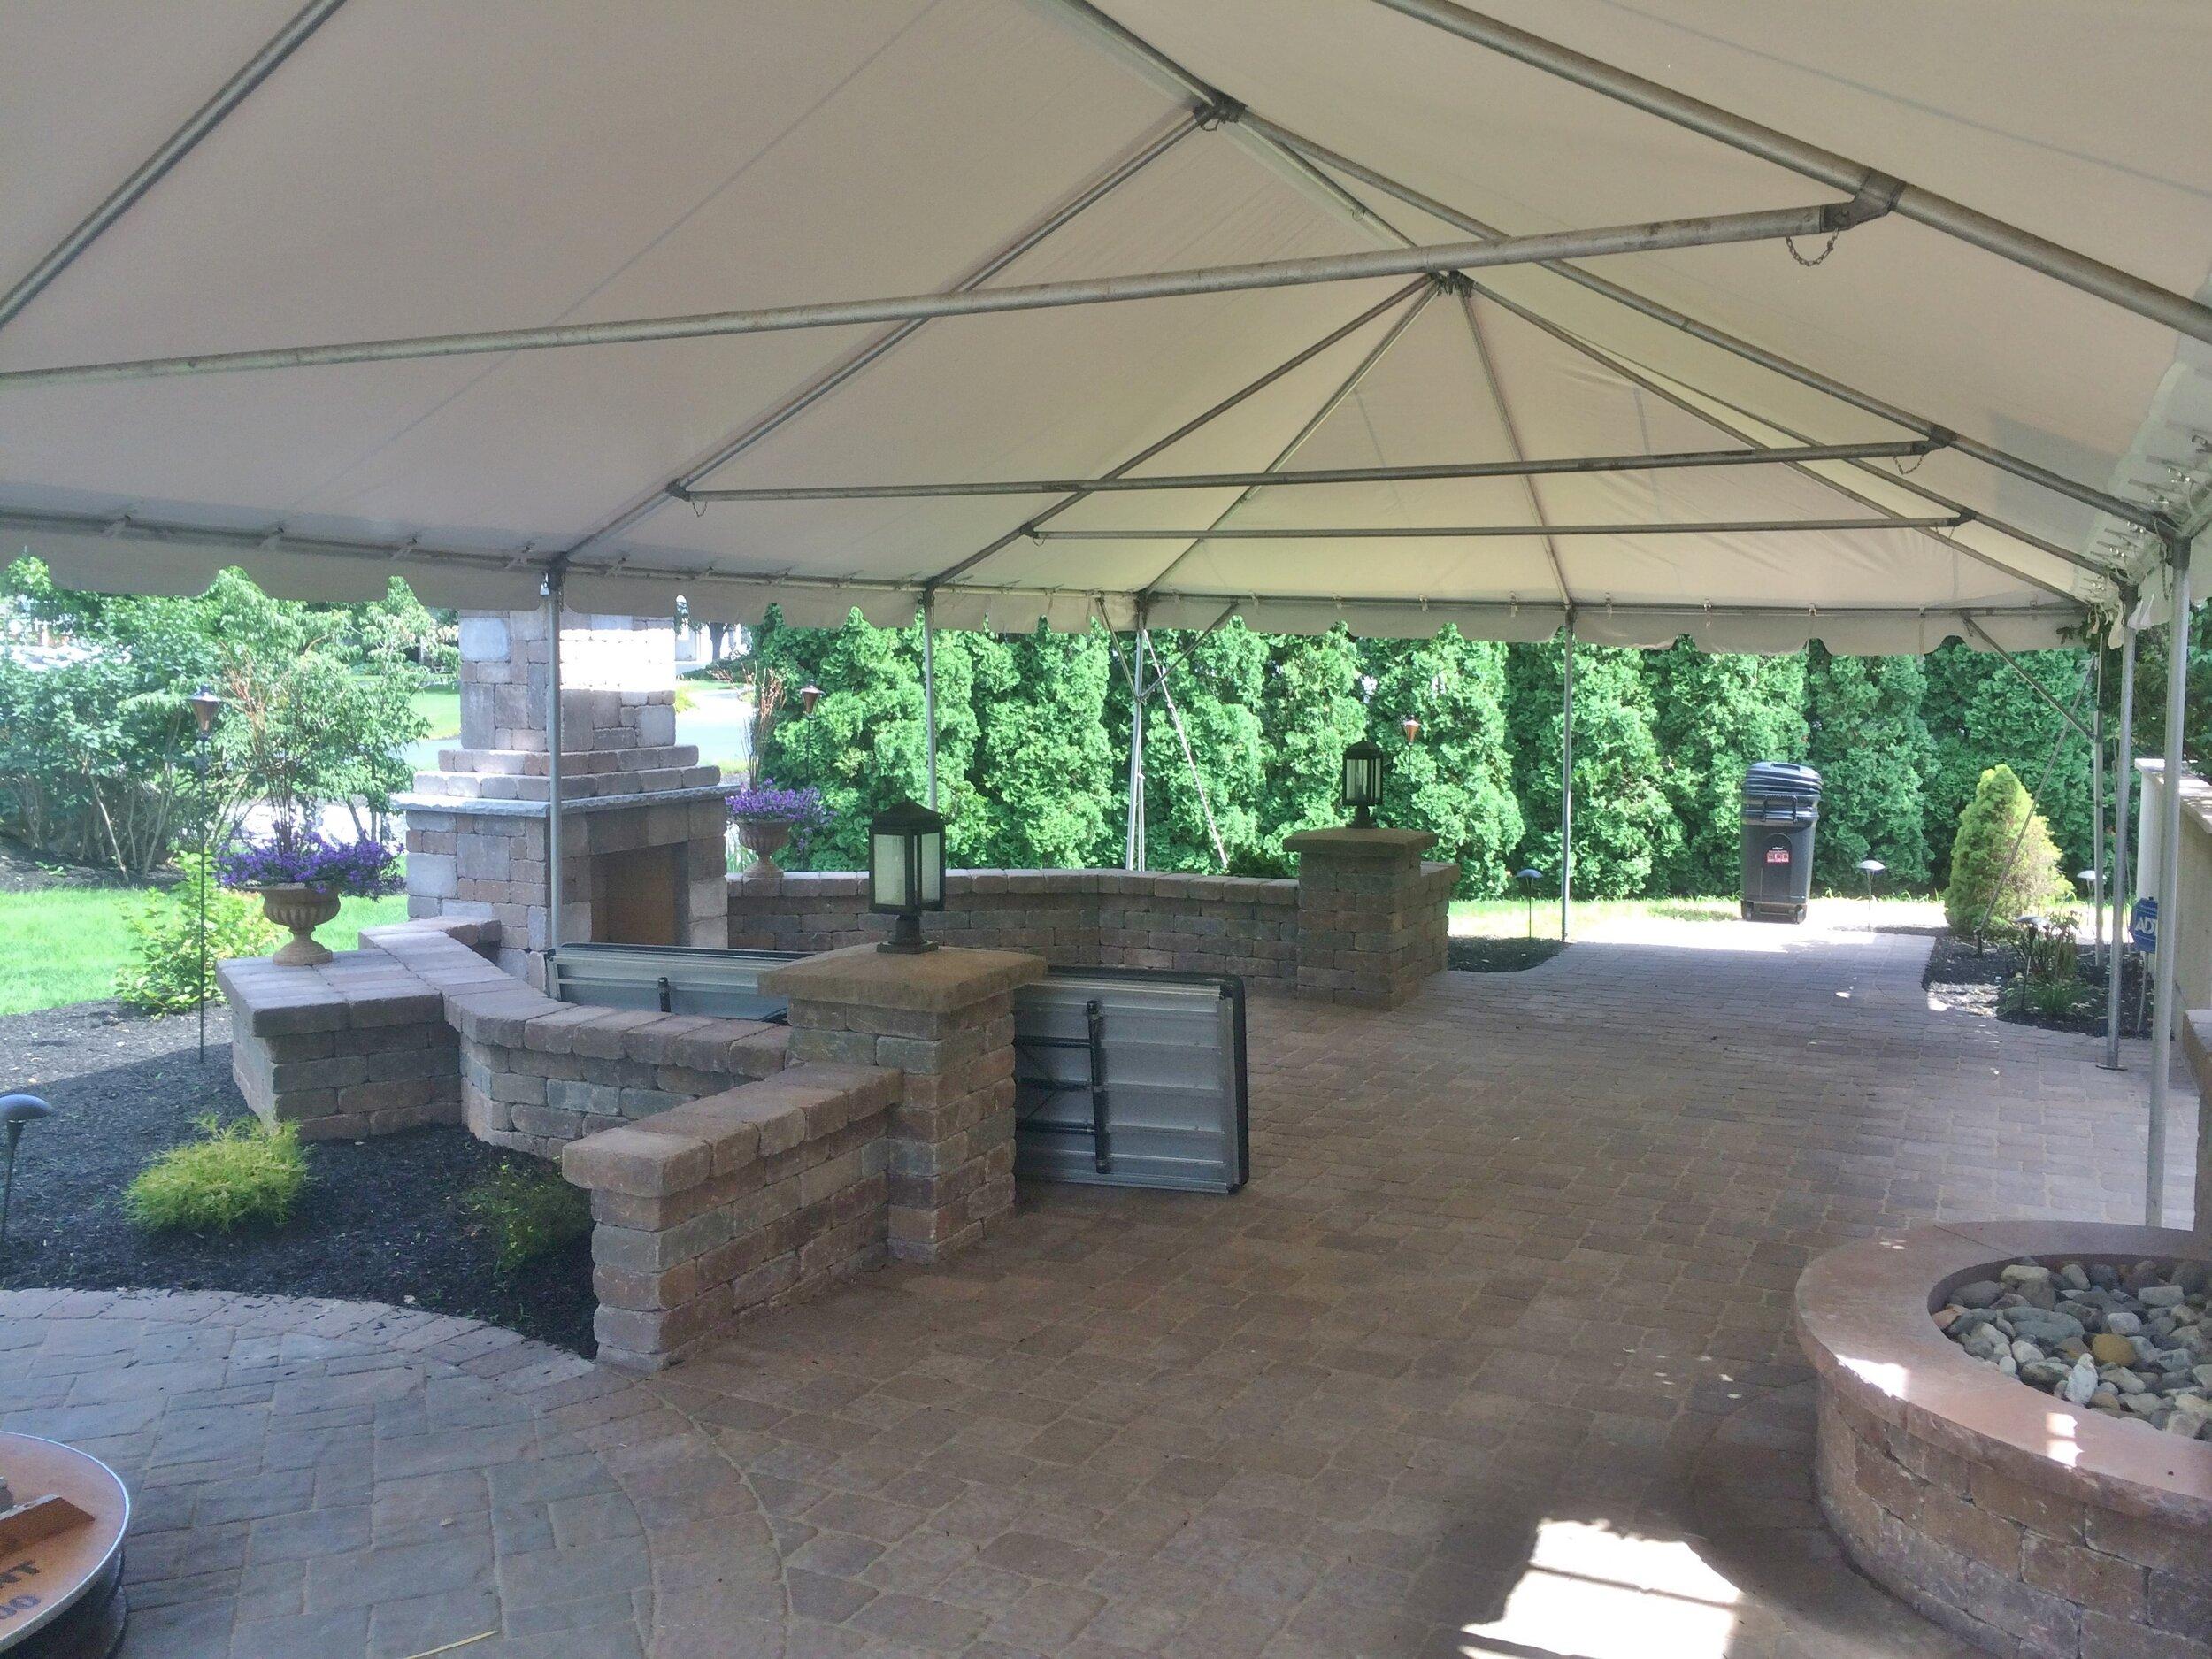 Summer patio tent